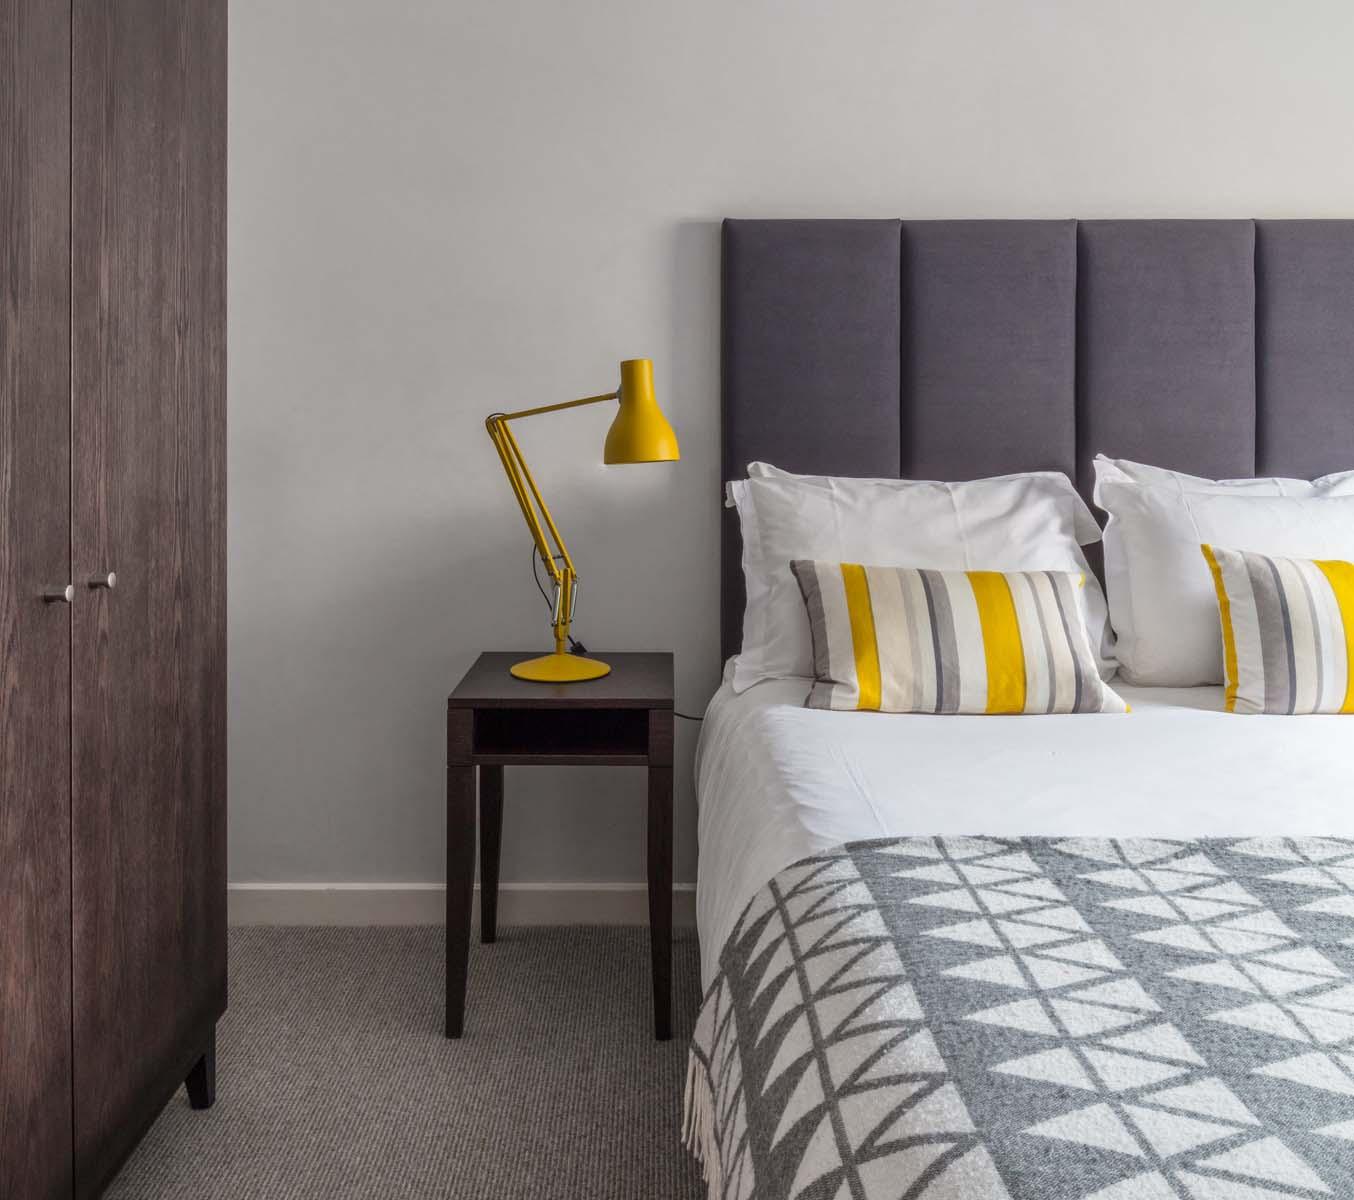 Stylish bedroom at Saco Bath – St James's Parade - Citybase Apartments